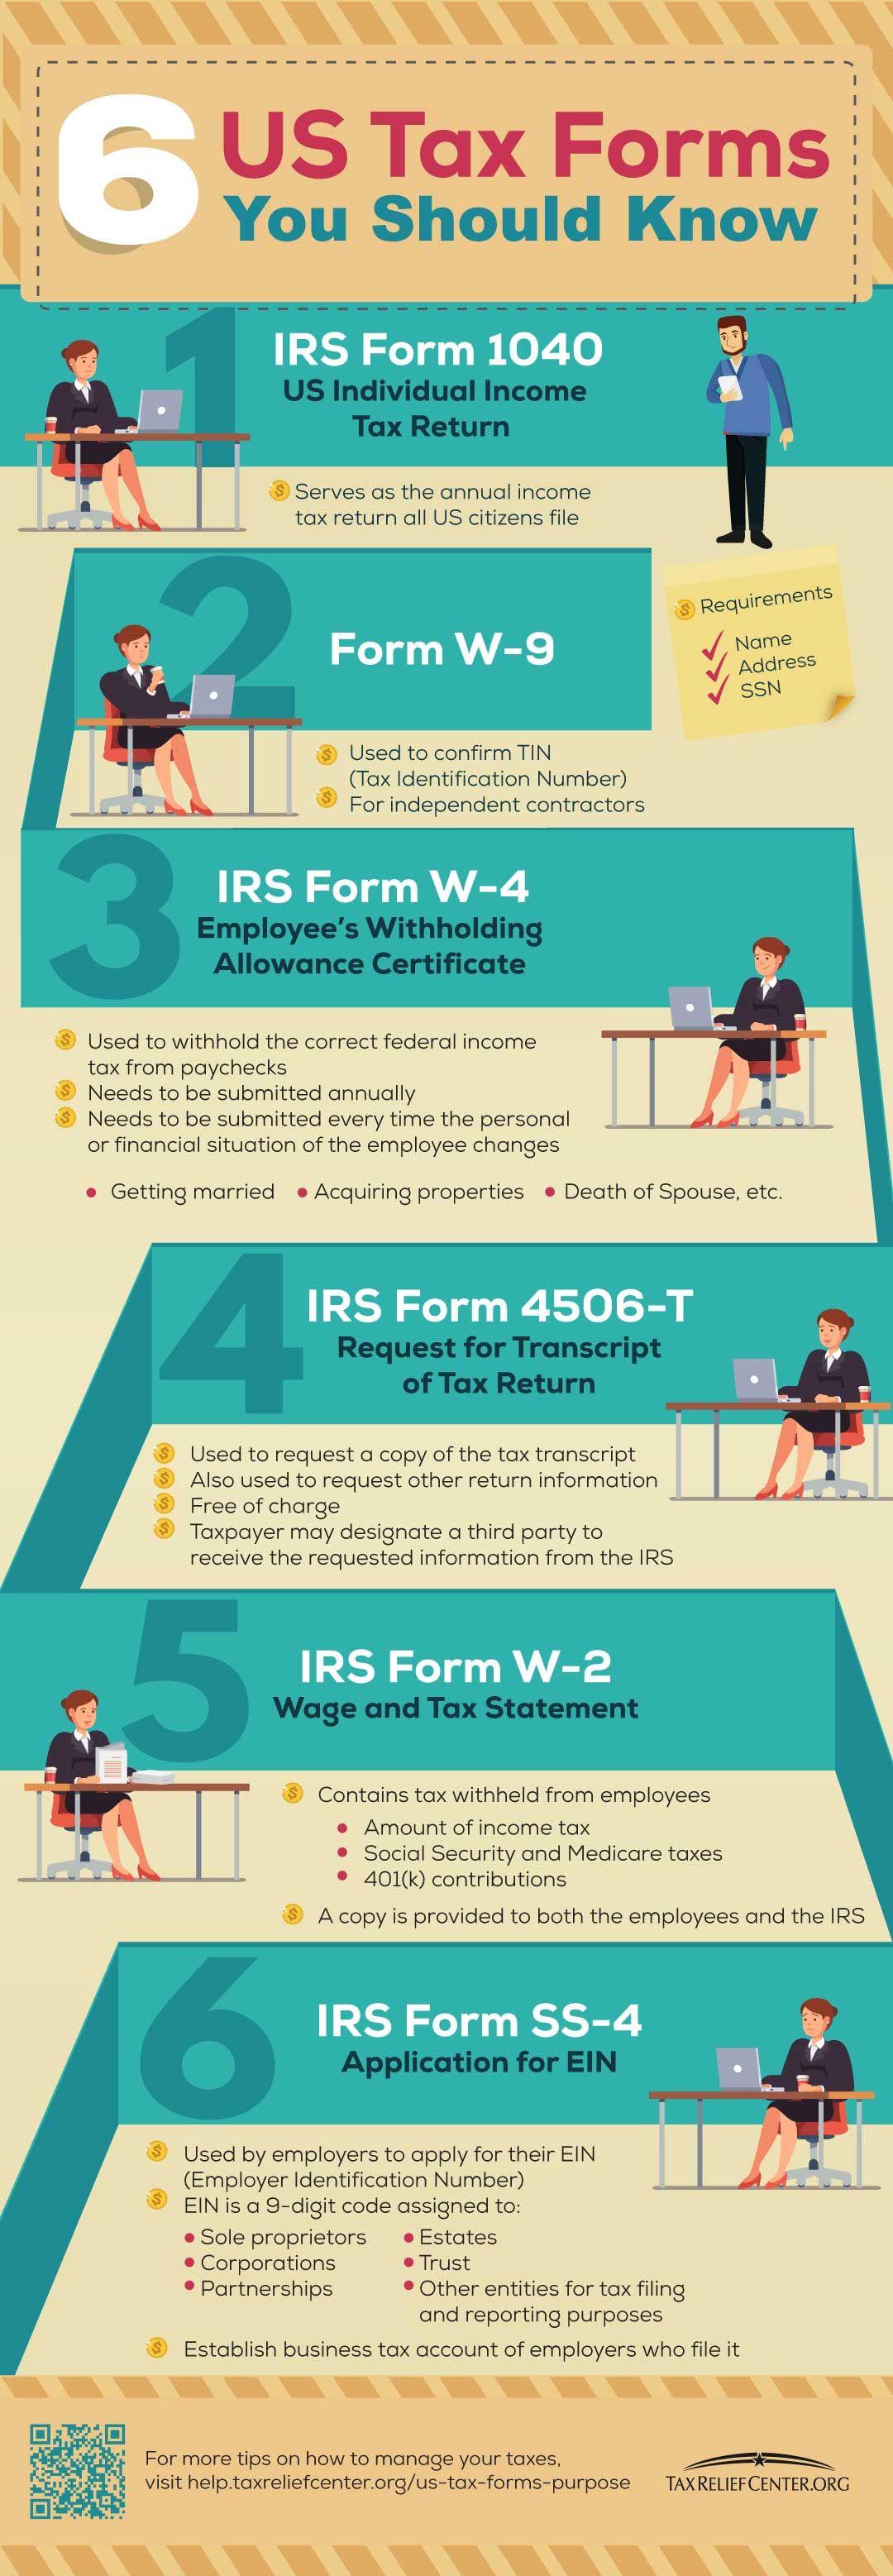 4b2560e48b1a1b59174899853933c2ac - How To Get The Most From Income Tax Return